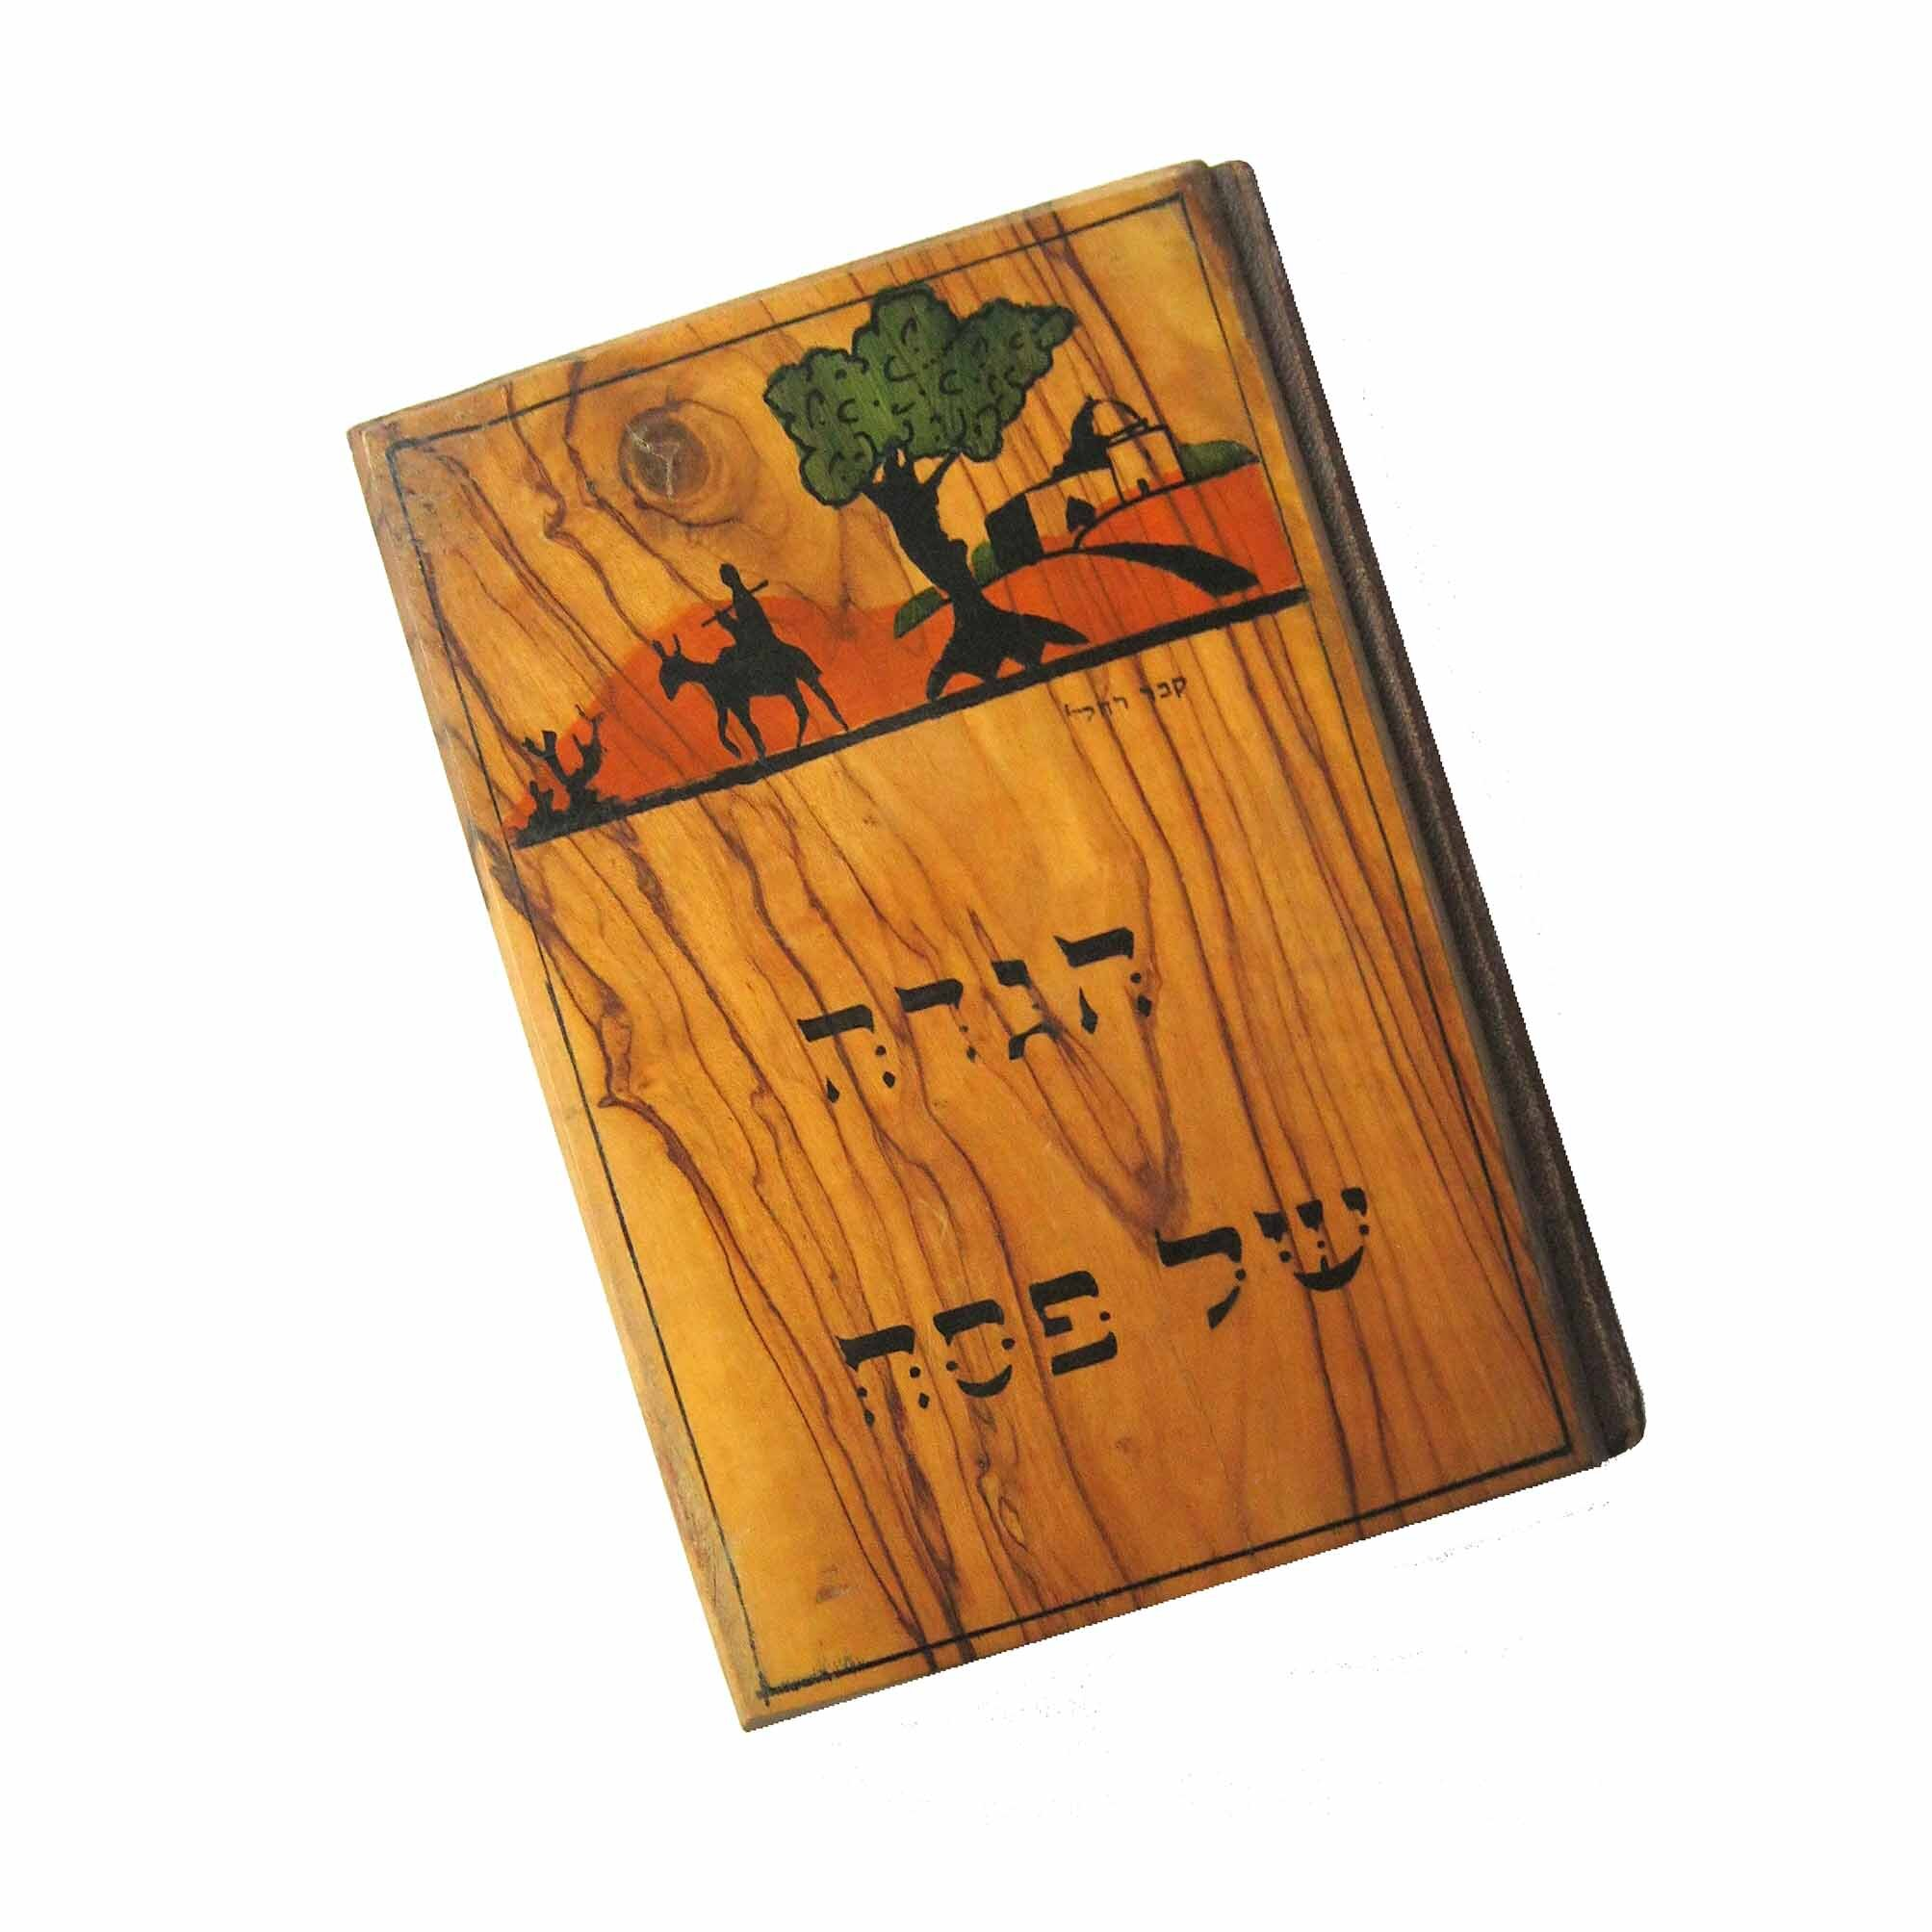 5616 Unna Passover Haggadah Onamut 1937 Cover free N